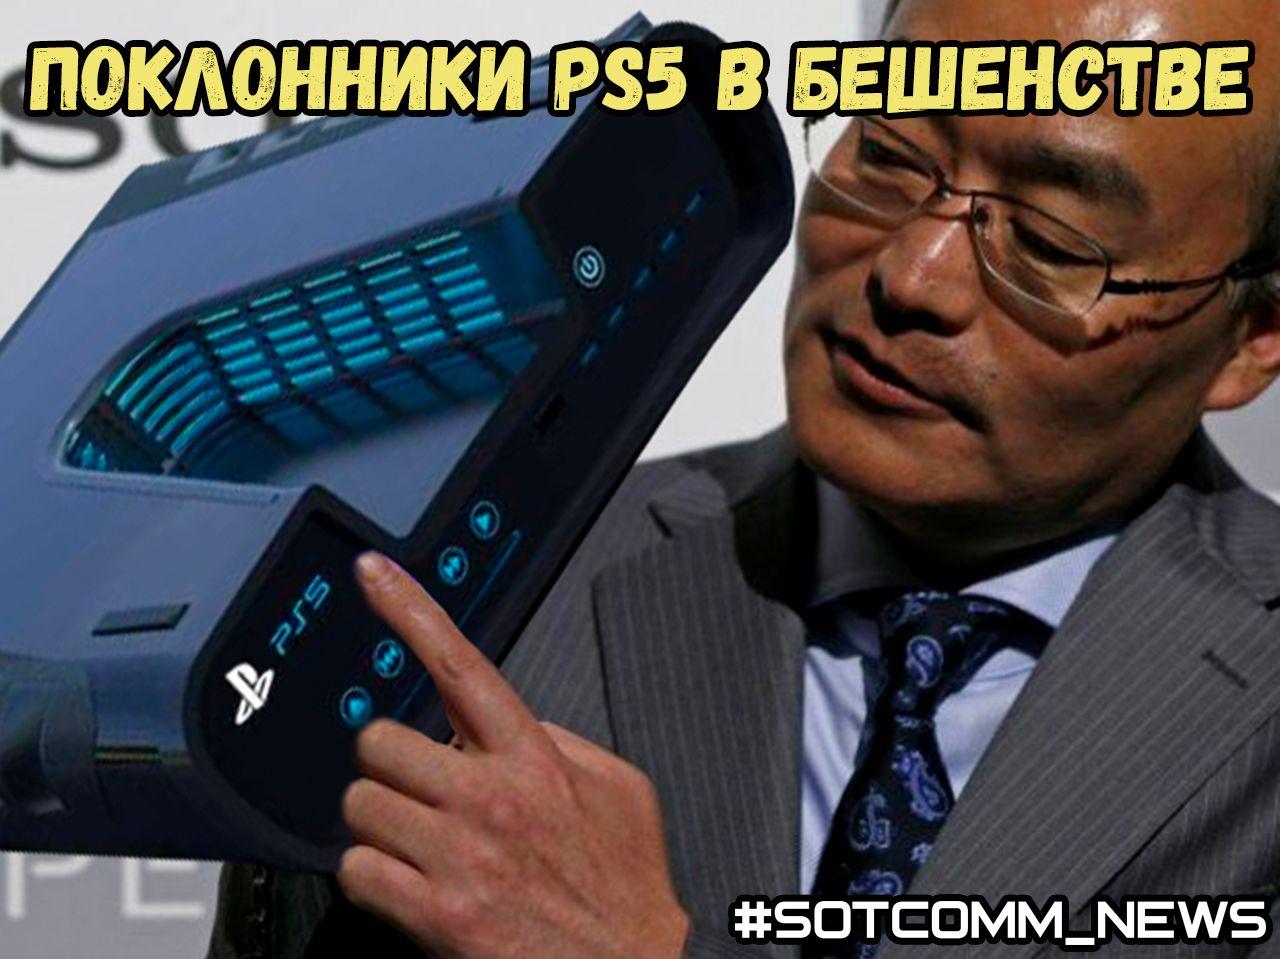 Фанаты PS5 в бешенстве